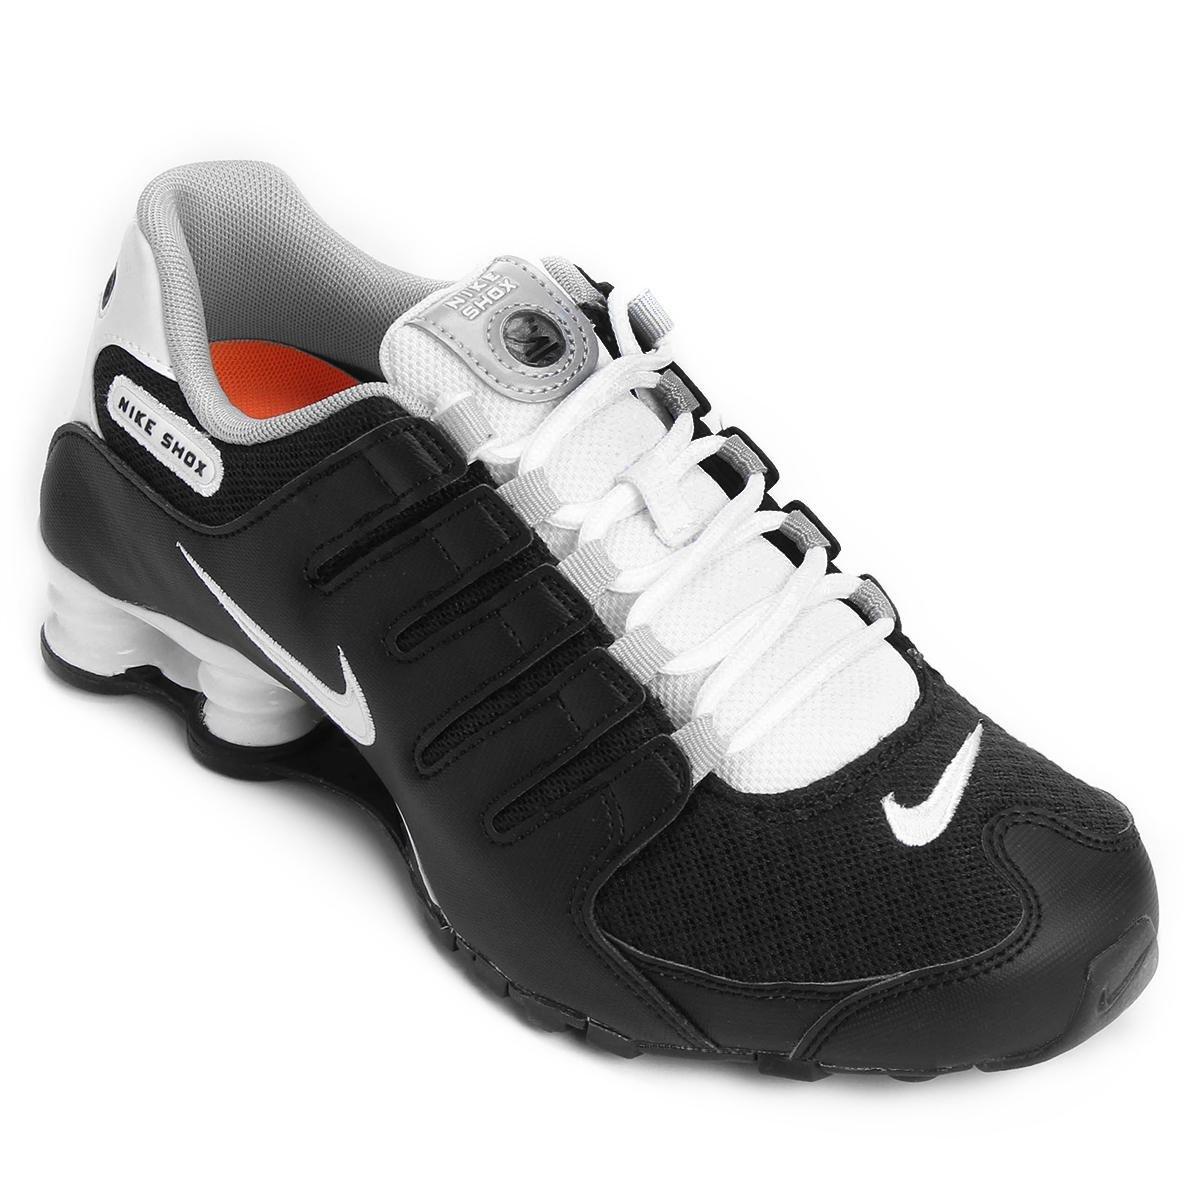 competitive price 04865 1be04 Tênis Nike Shox Nz Se - Preto e Branco - Compre Agora  Netsh